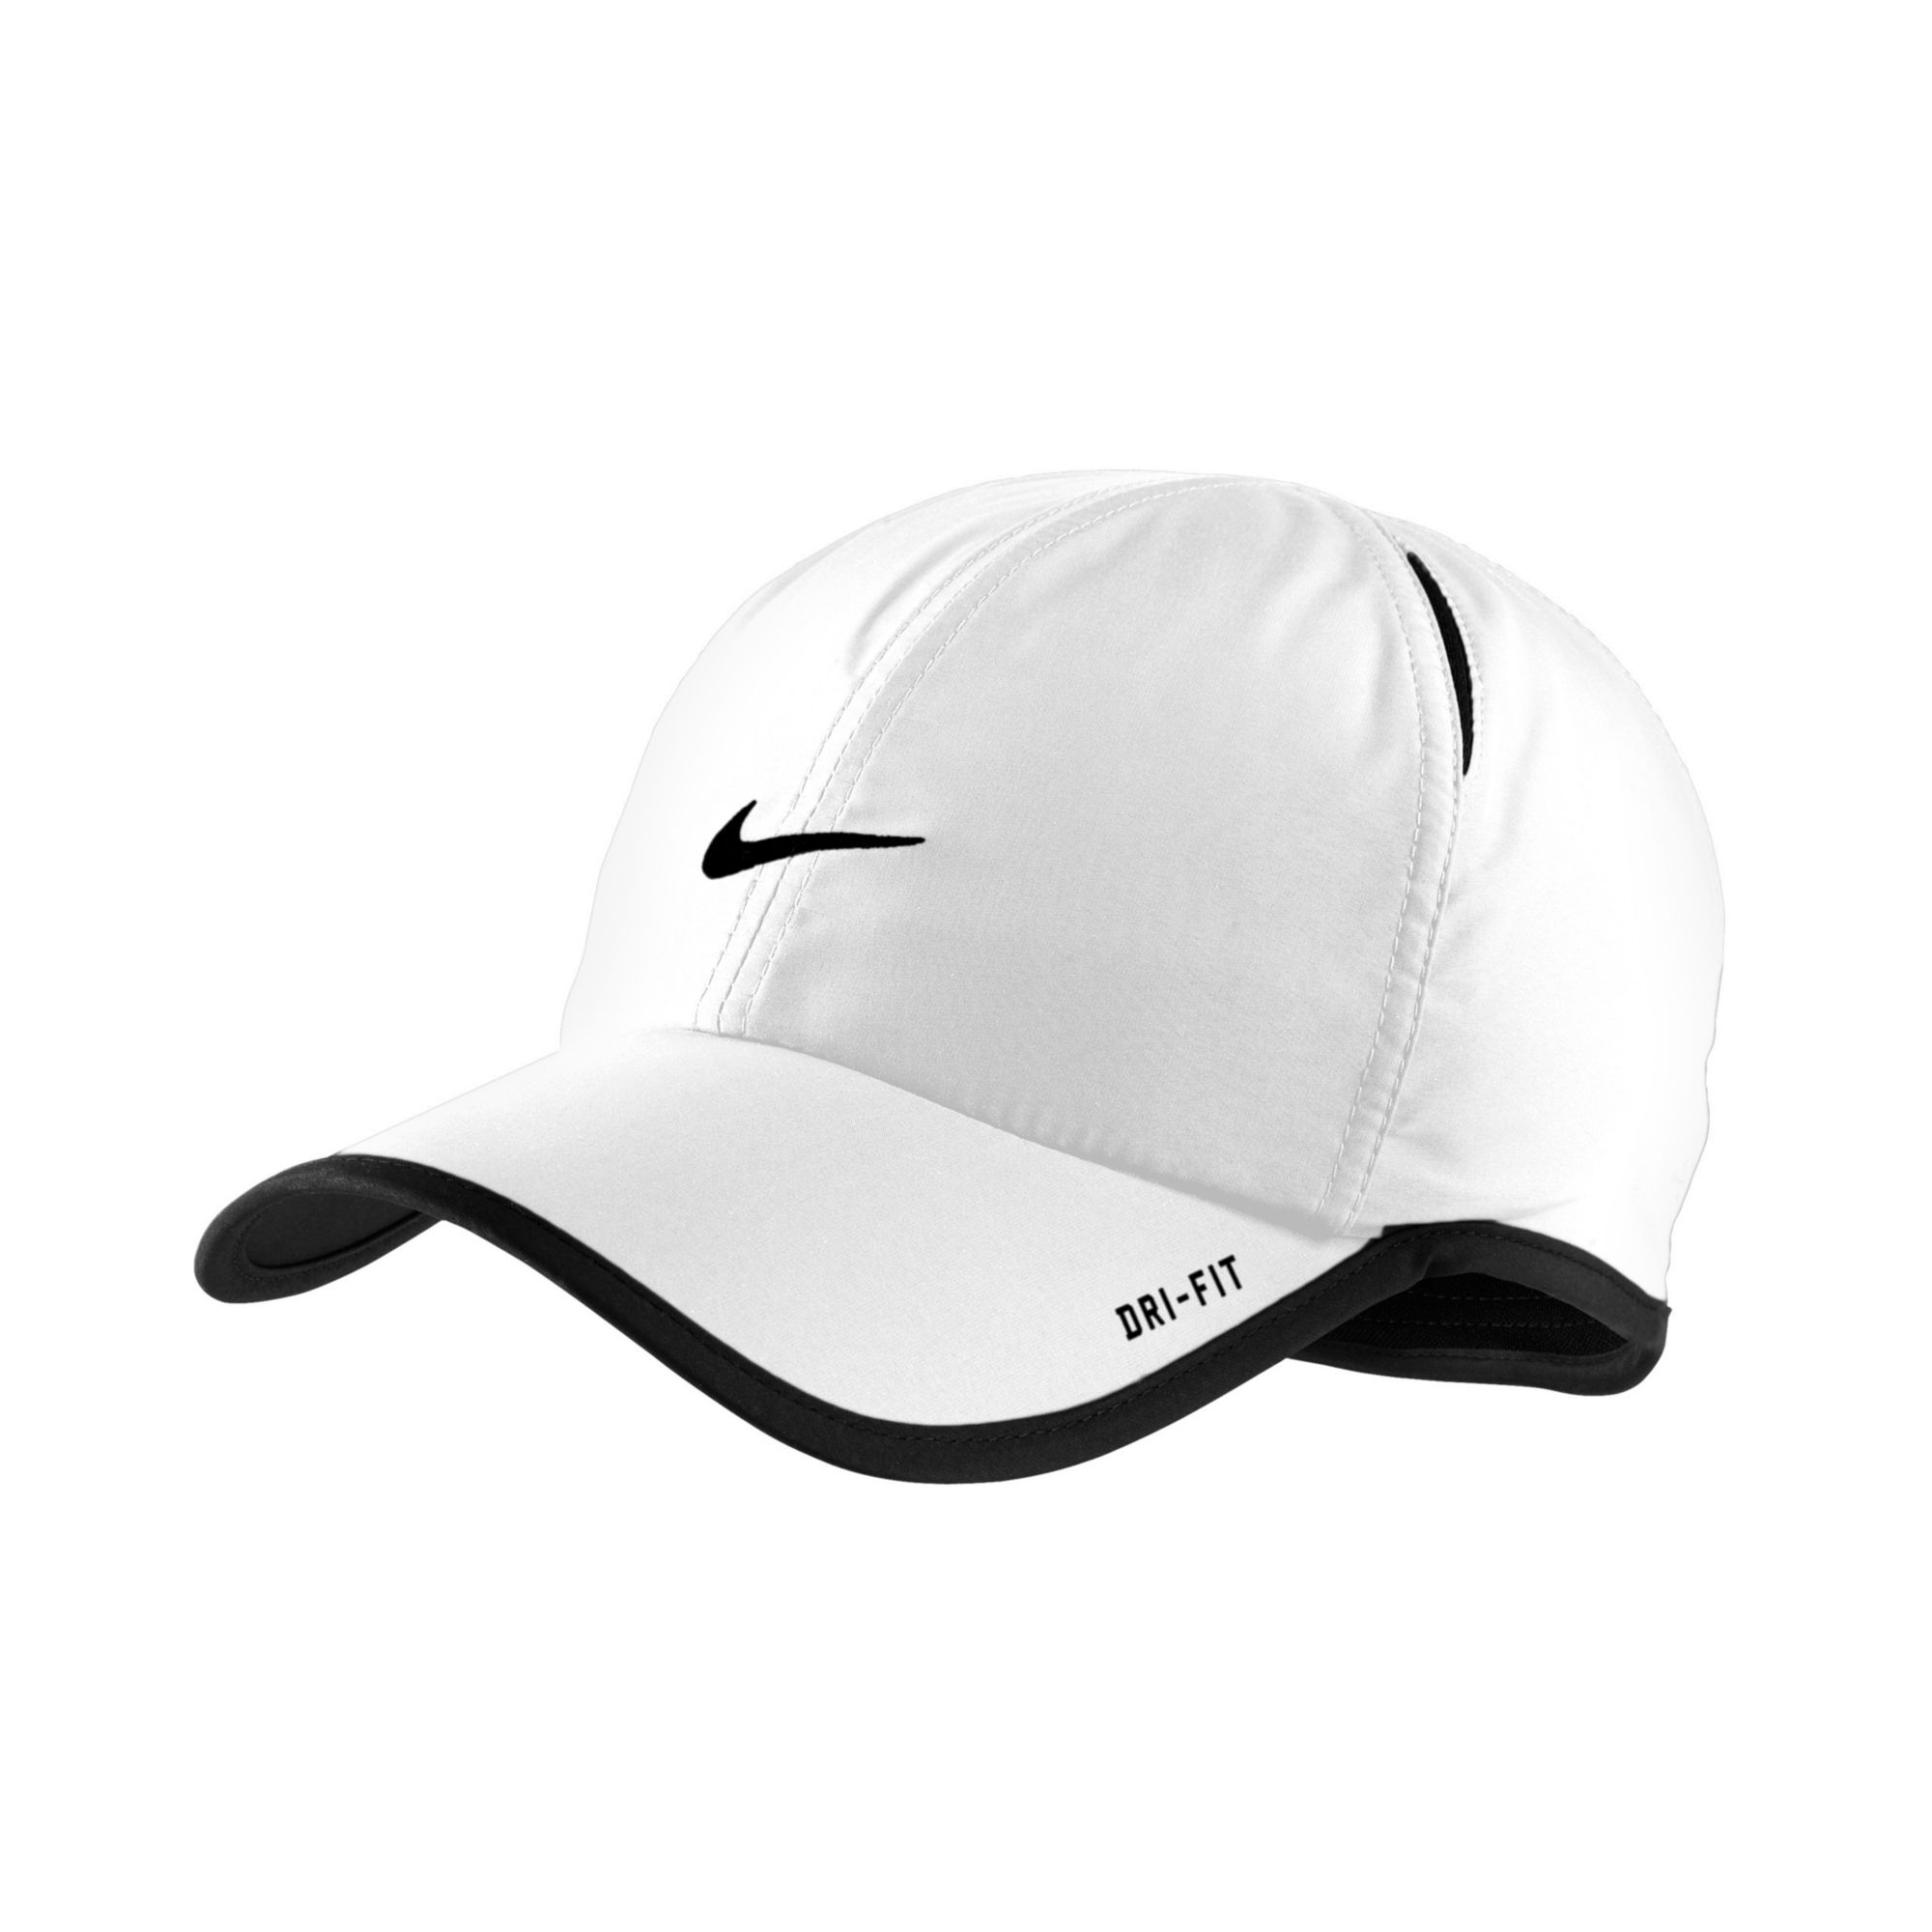 the best attitude 1ff3d b2d7b ... usa lyst nike dri fit feather light cap in black for men 9f334 8a077